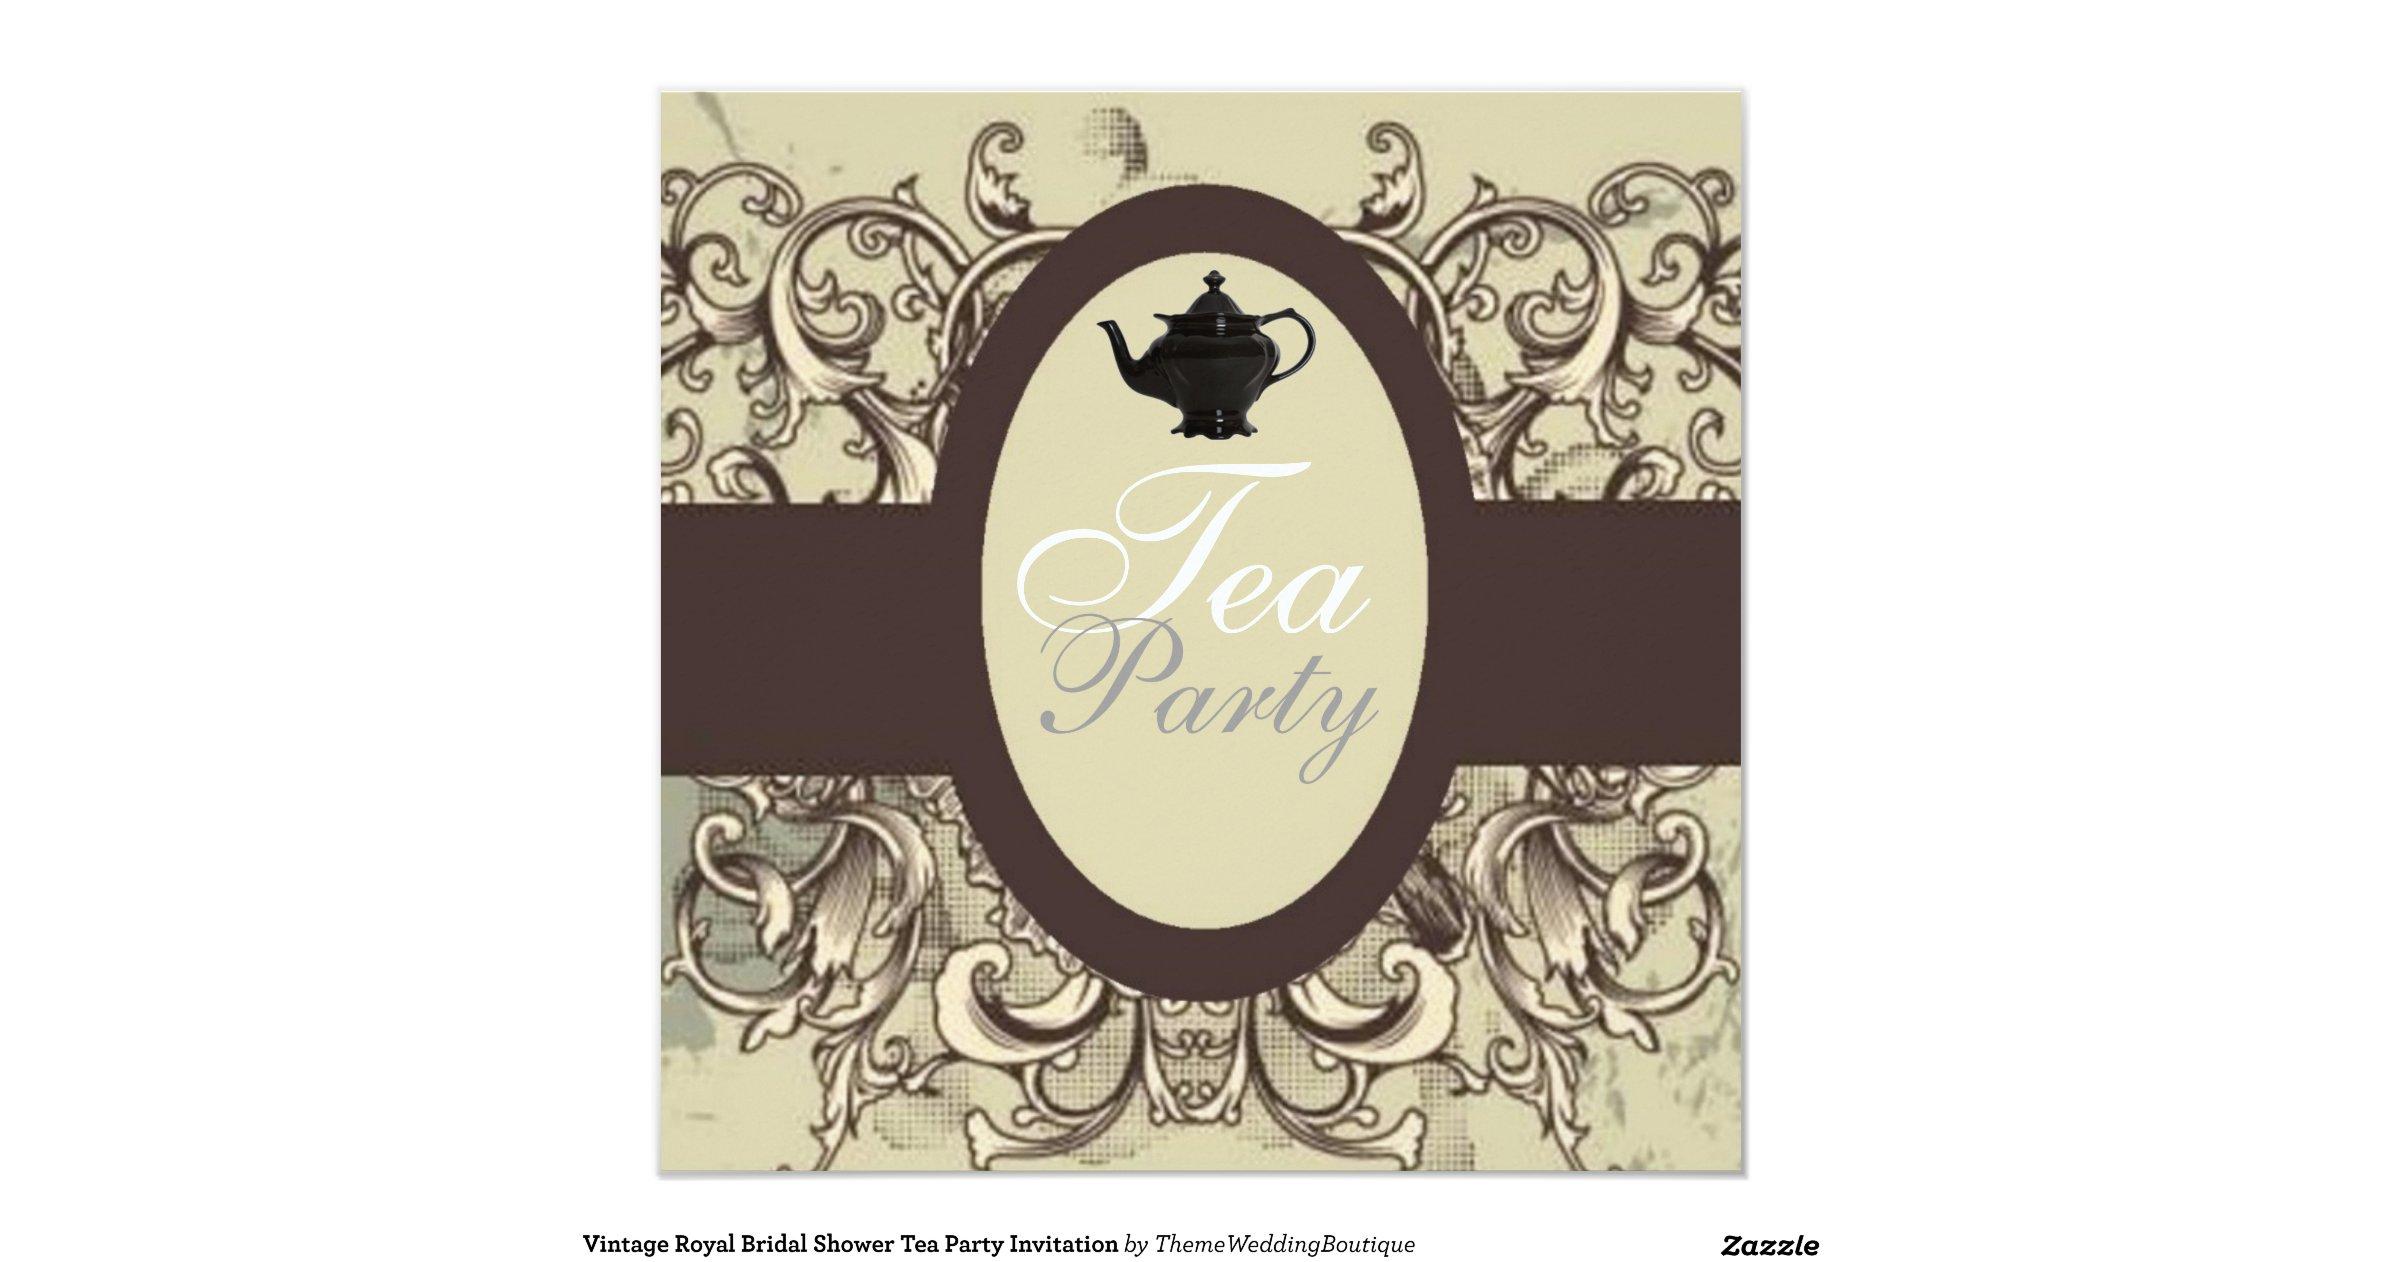 Vintage Tea Party Wedding Invitations: Vintage_royal_bridal_shower_tea_party_invitation